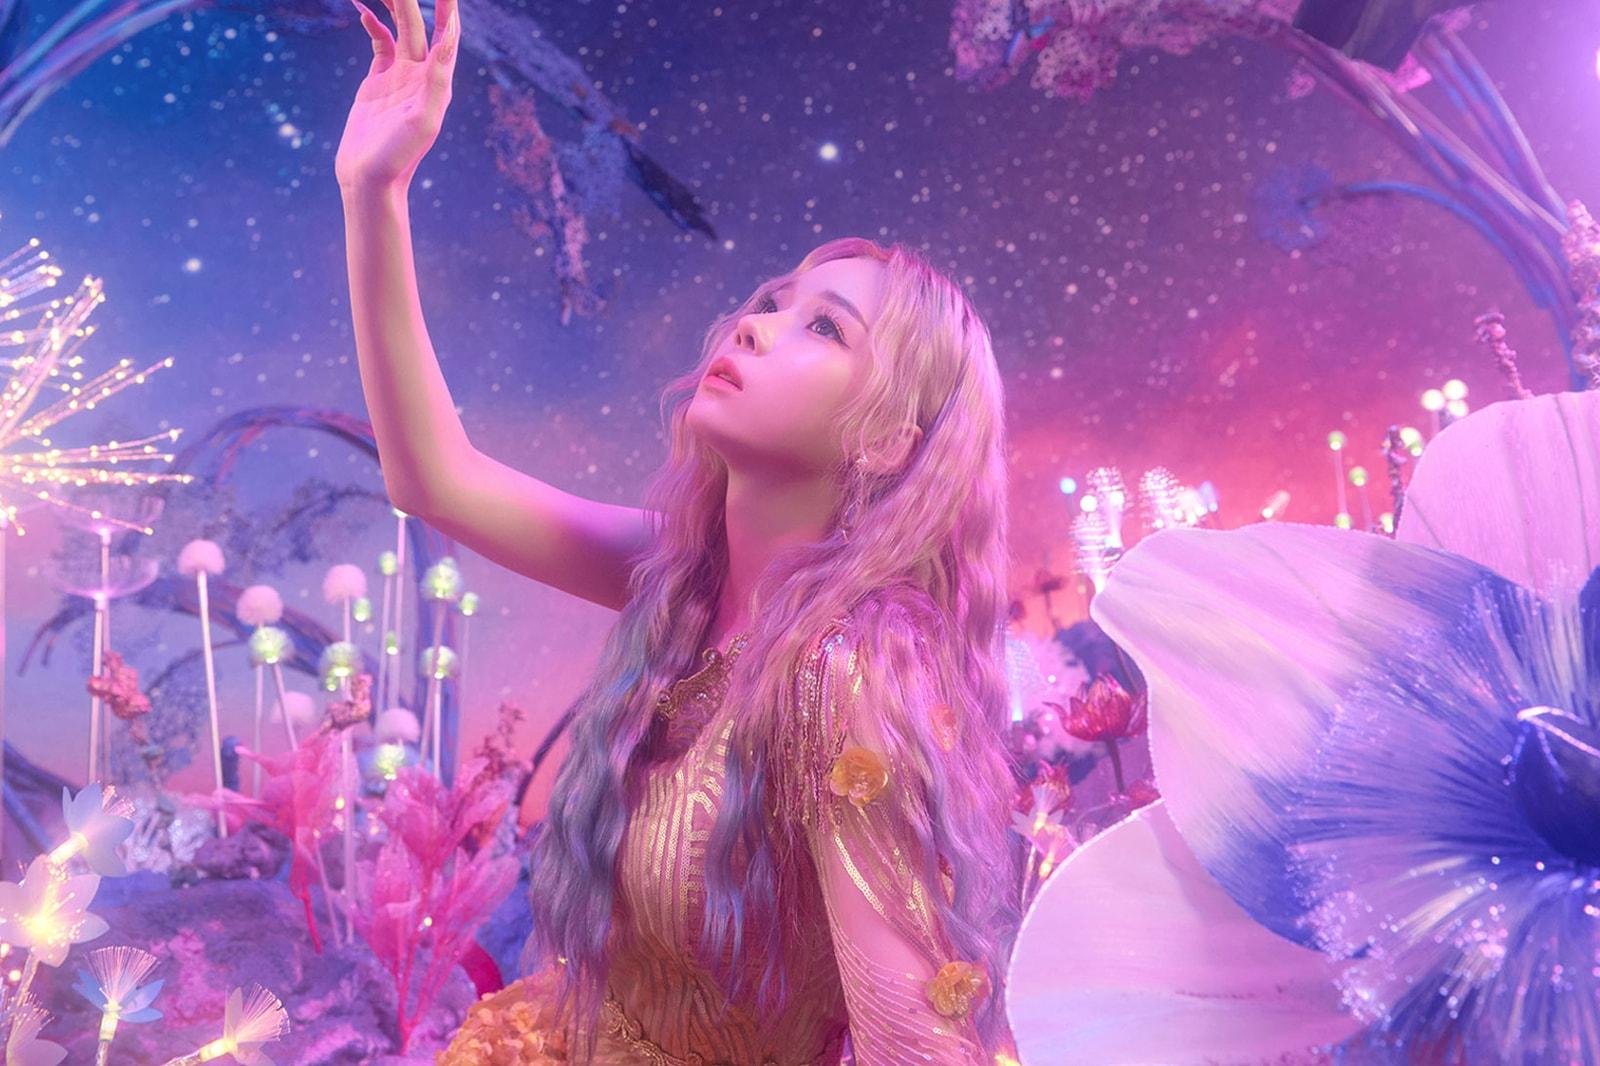 sm entertainment aespa new k-pop girl group virtual human winter